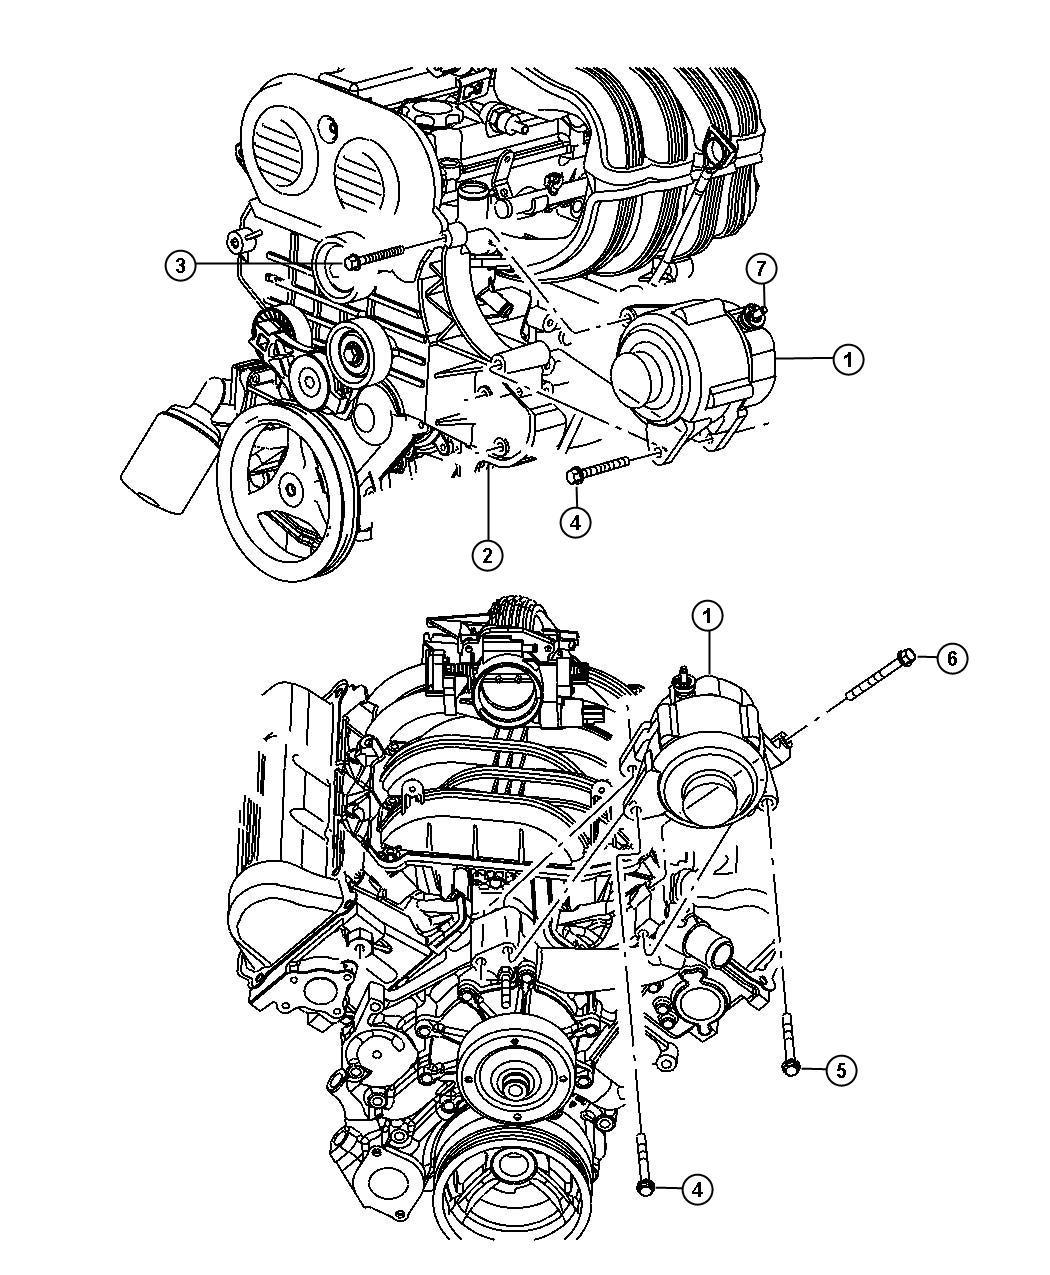 2009 Chrysler PT Cruiser Generator. Engine. Remanufactured